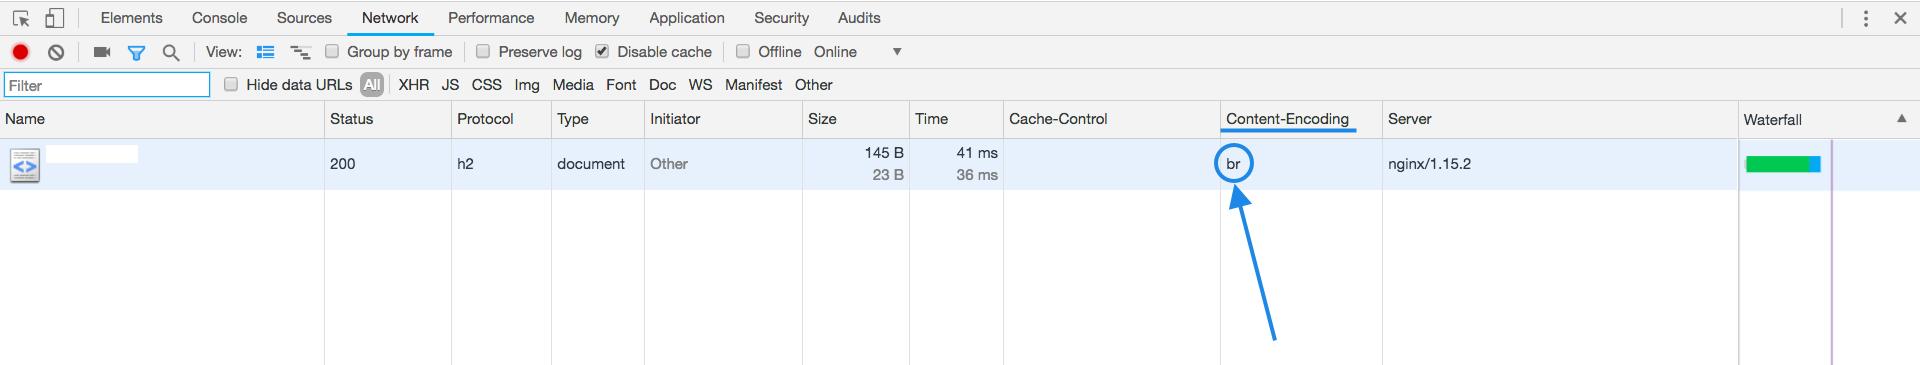 Add Brotli support to Nginx on Ubuntu 18 04 - Vultr com